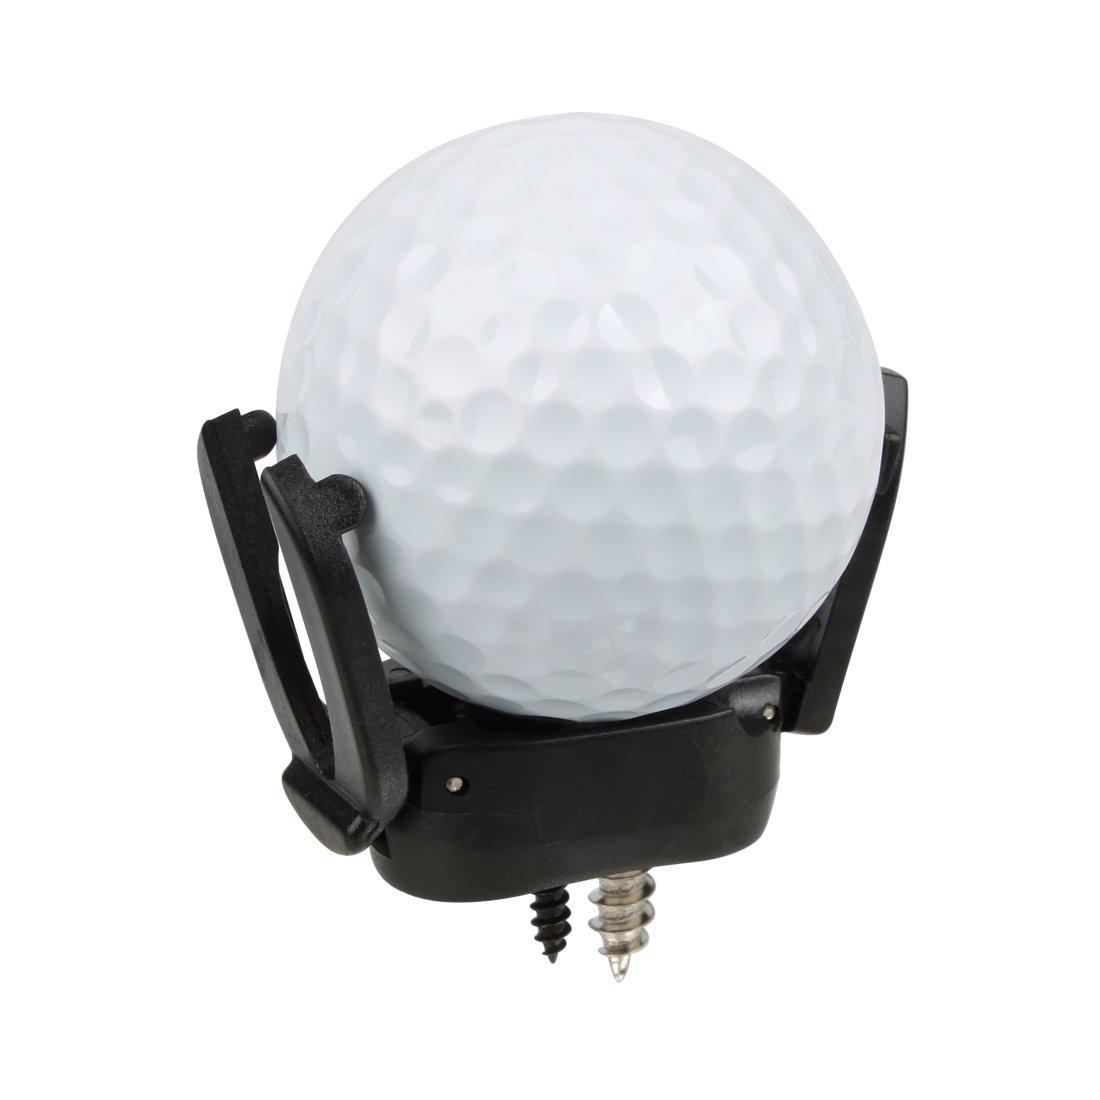 Andux recogebolas golf pickup fácil de usar y para totos putter bola QJ/01